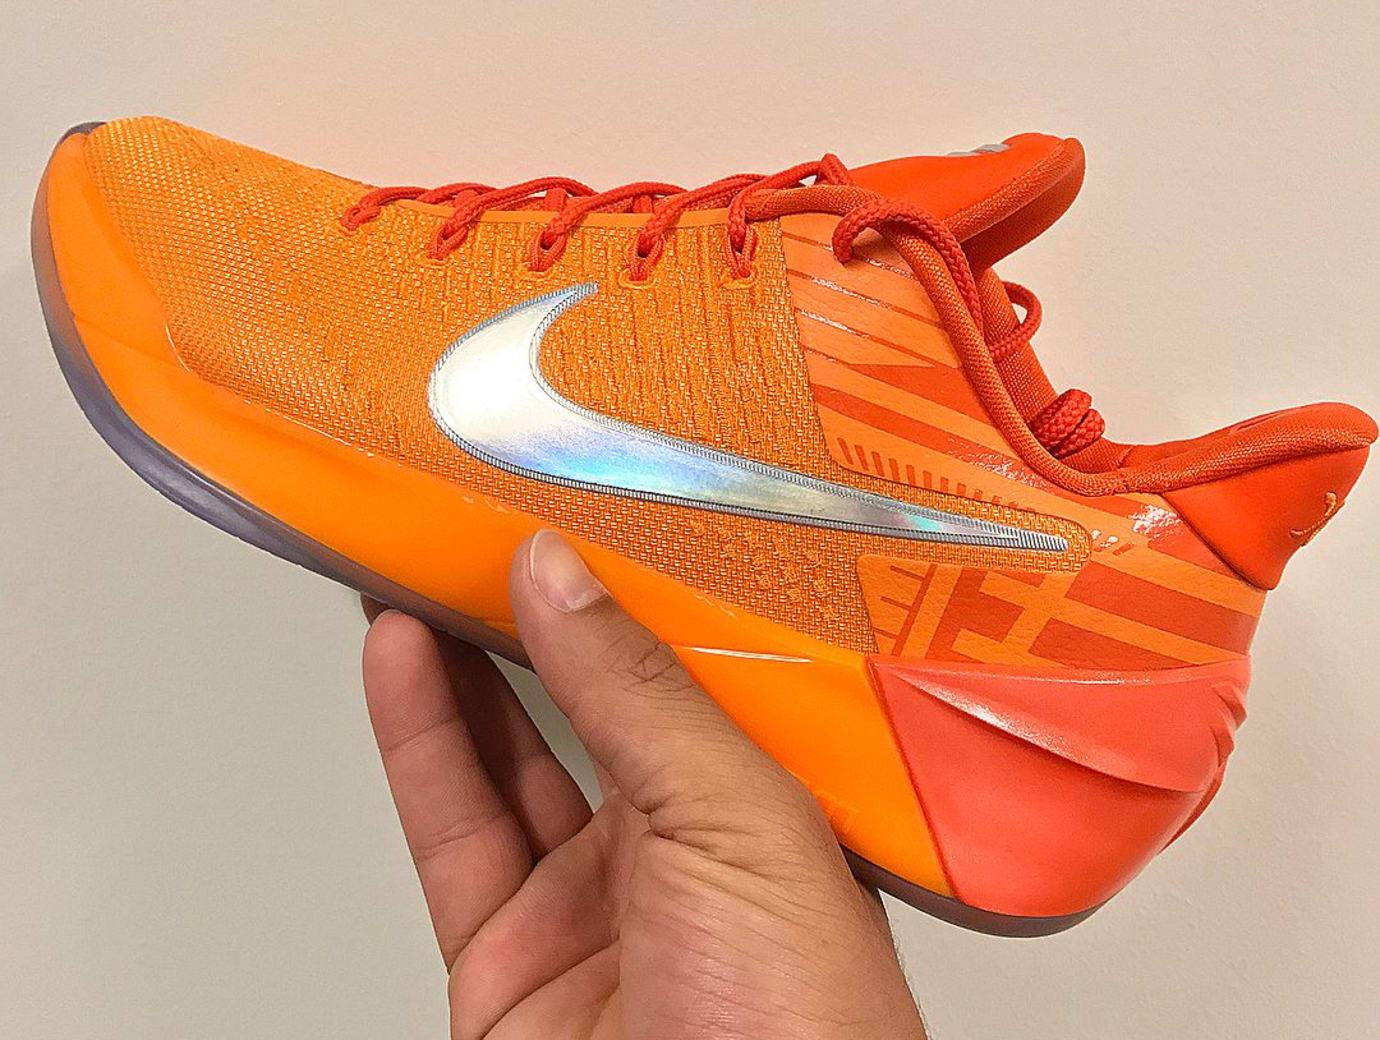 new styles 61277 fb077 Nike Kobe AD WNBA West All Star